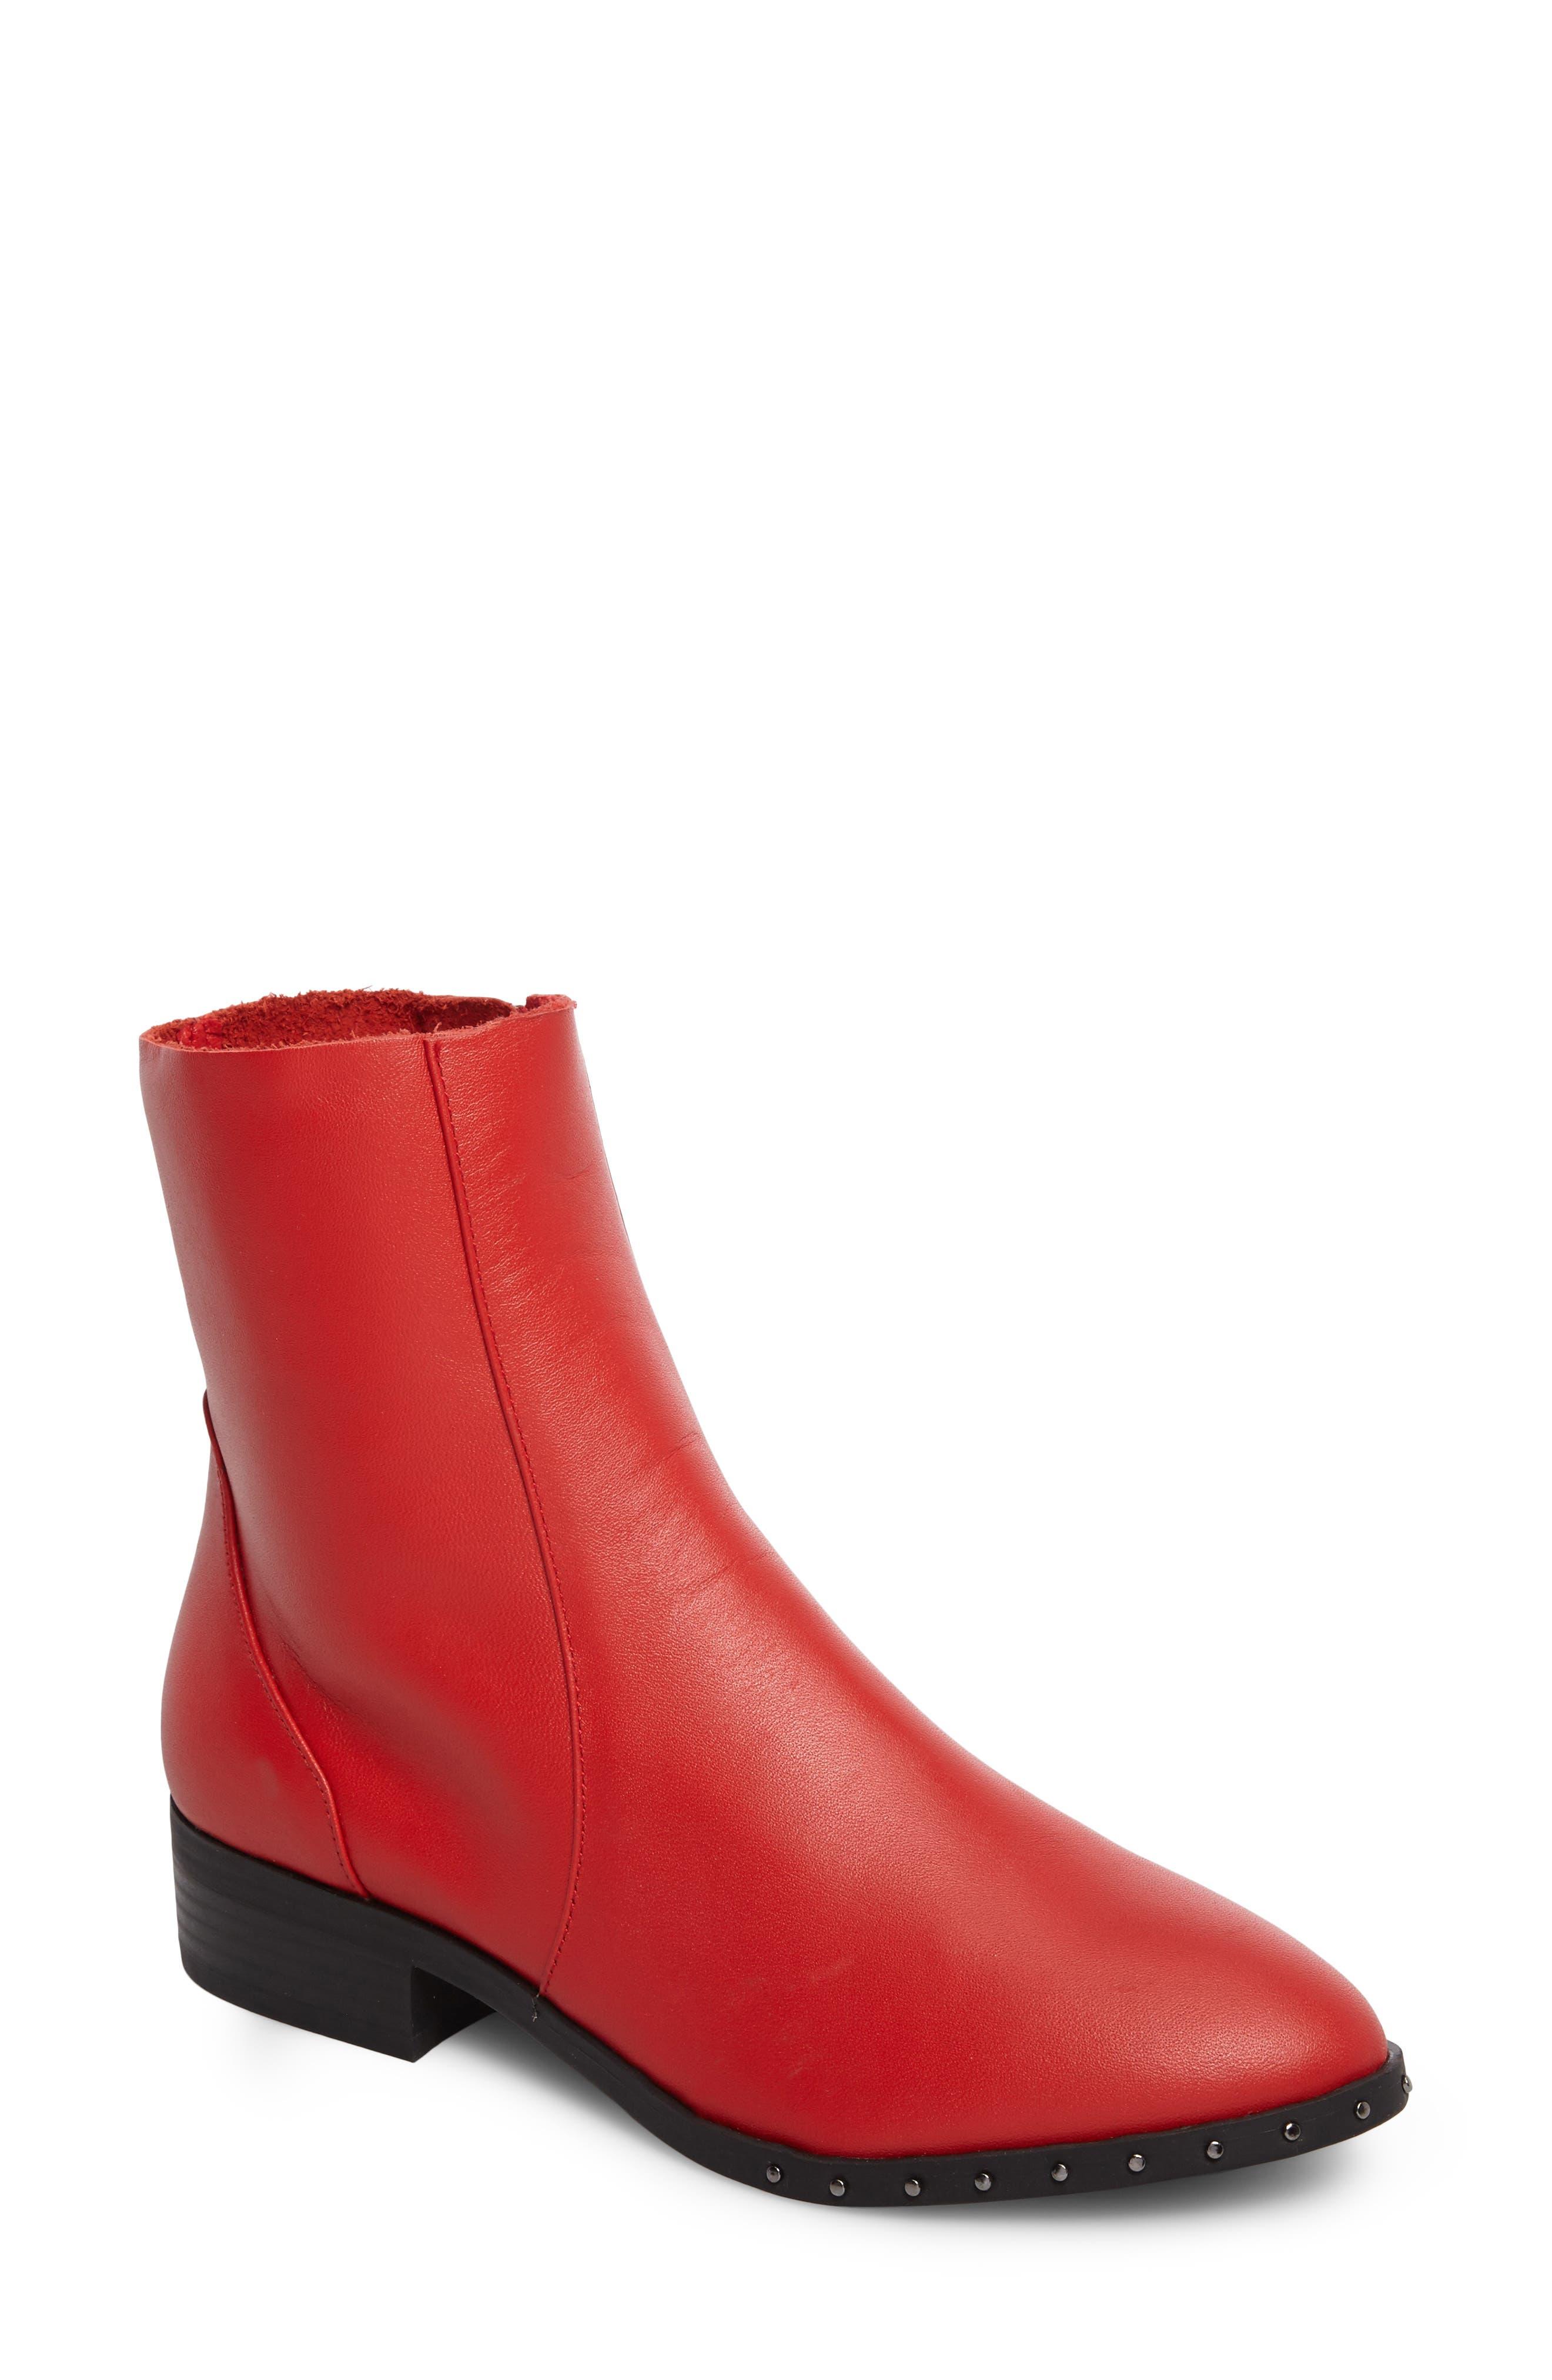 Alternate Image 1 Selected - Topshop Kash Sock Boot (Women)